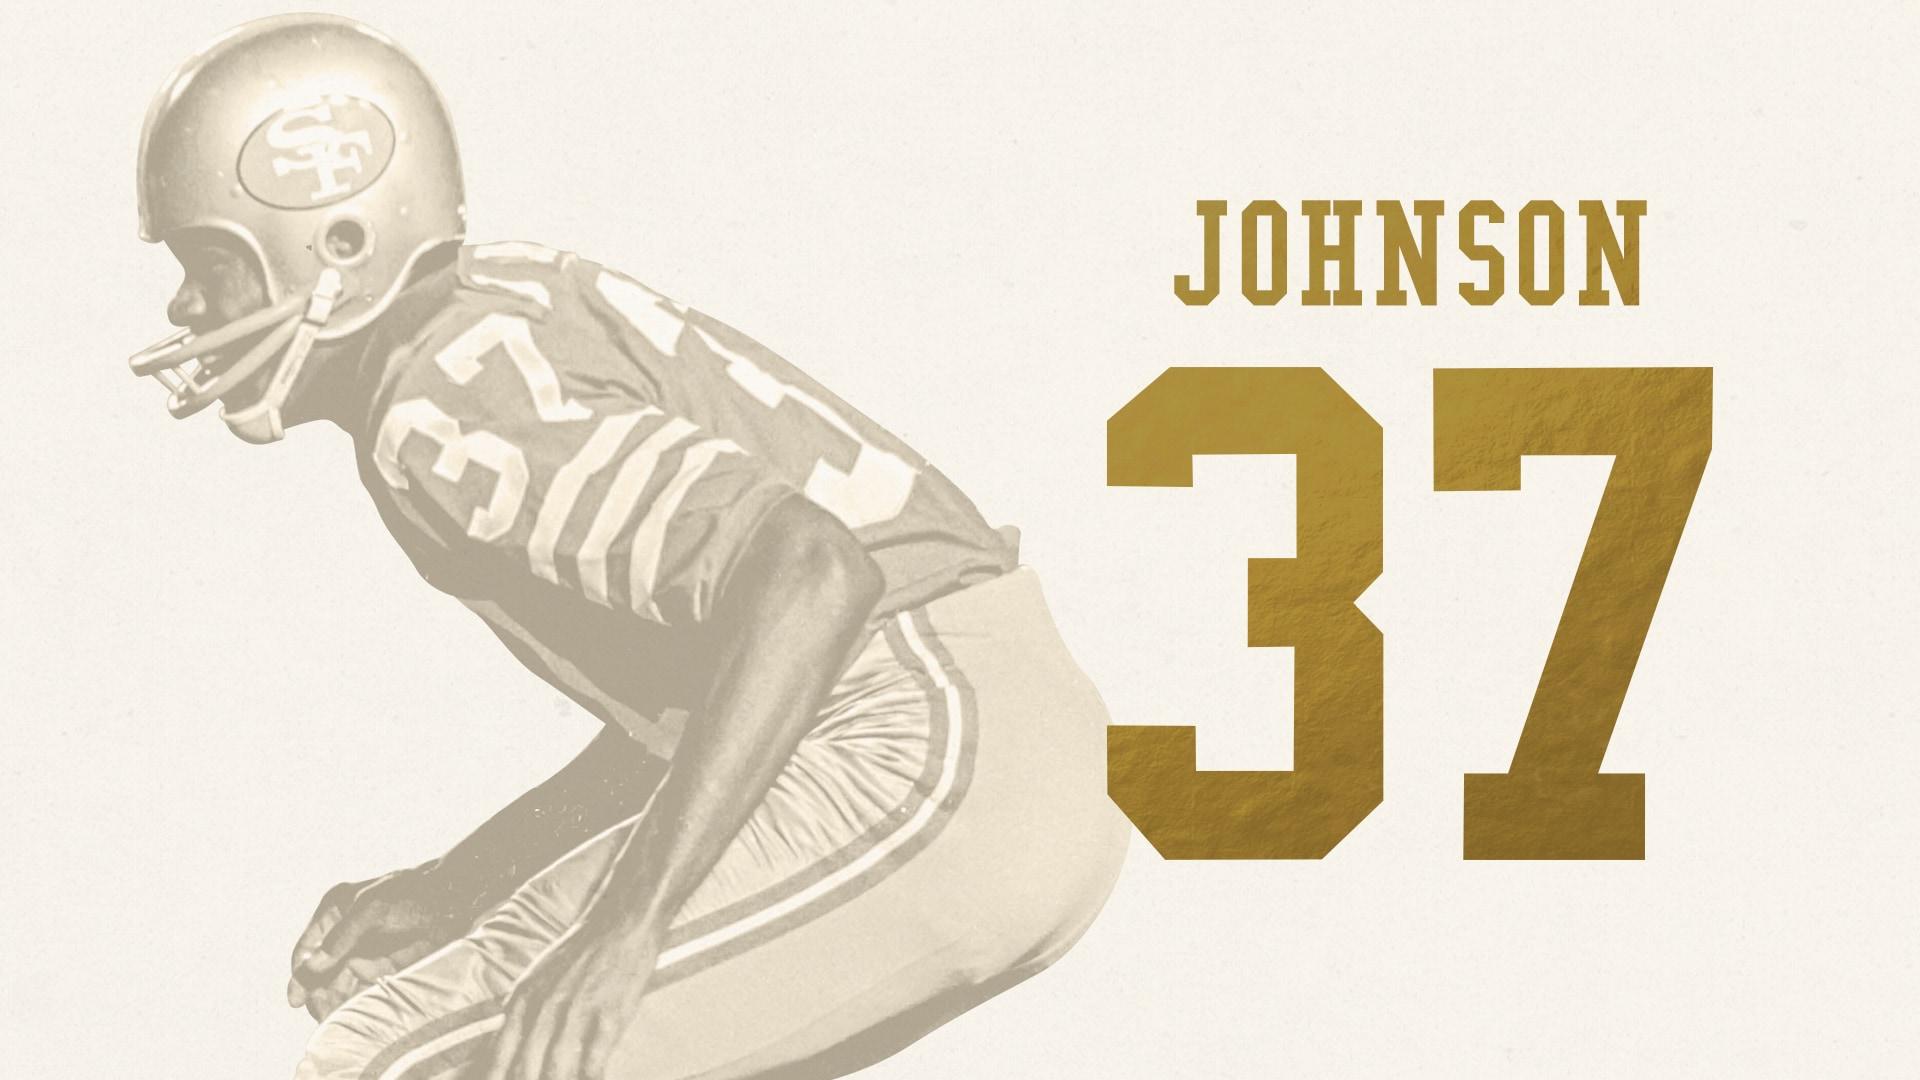 Jimmy Johnson, CB (1961-1976)